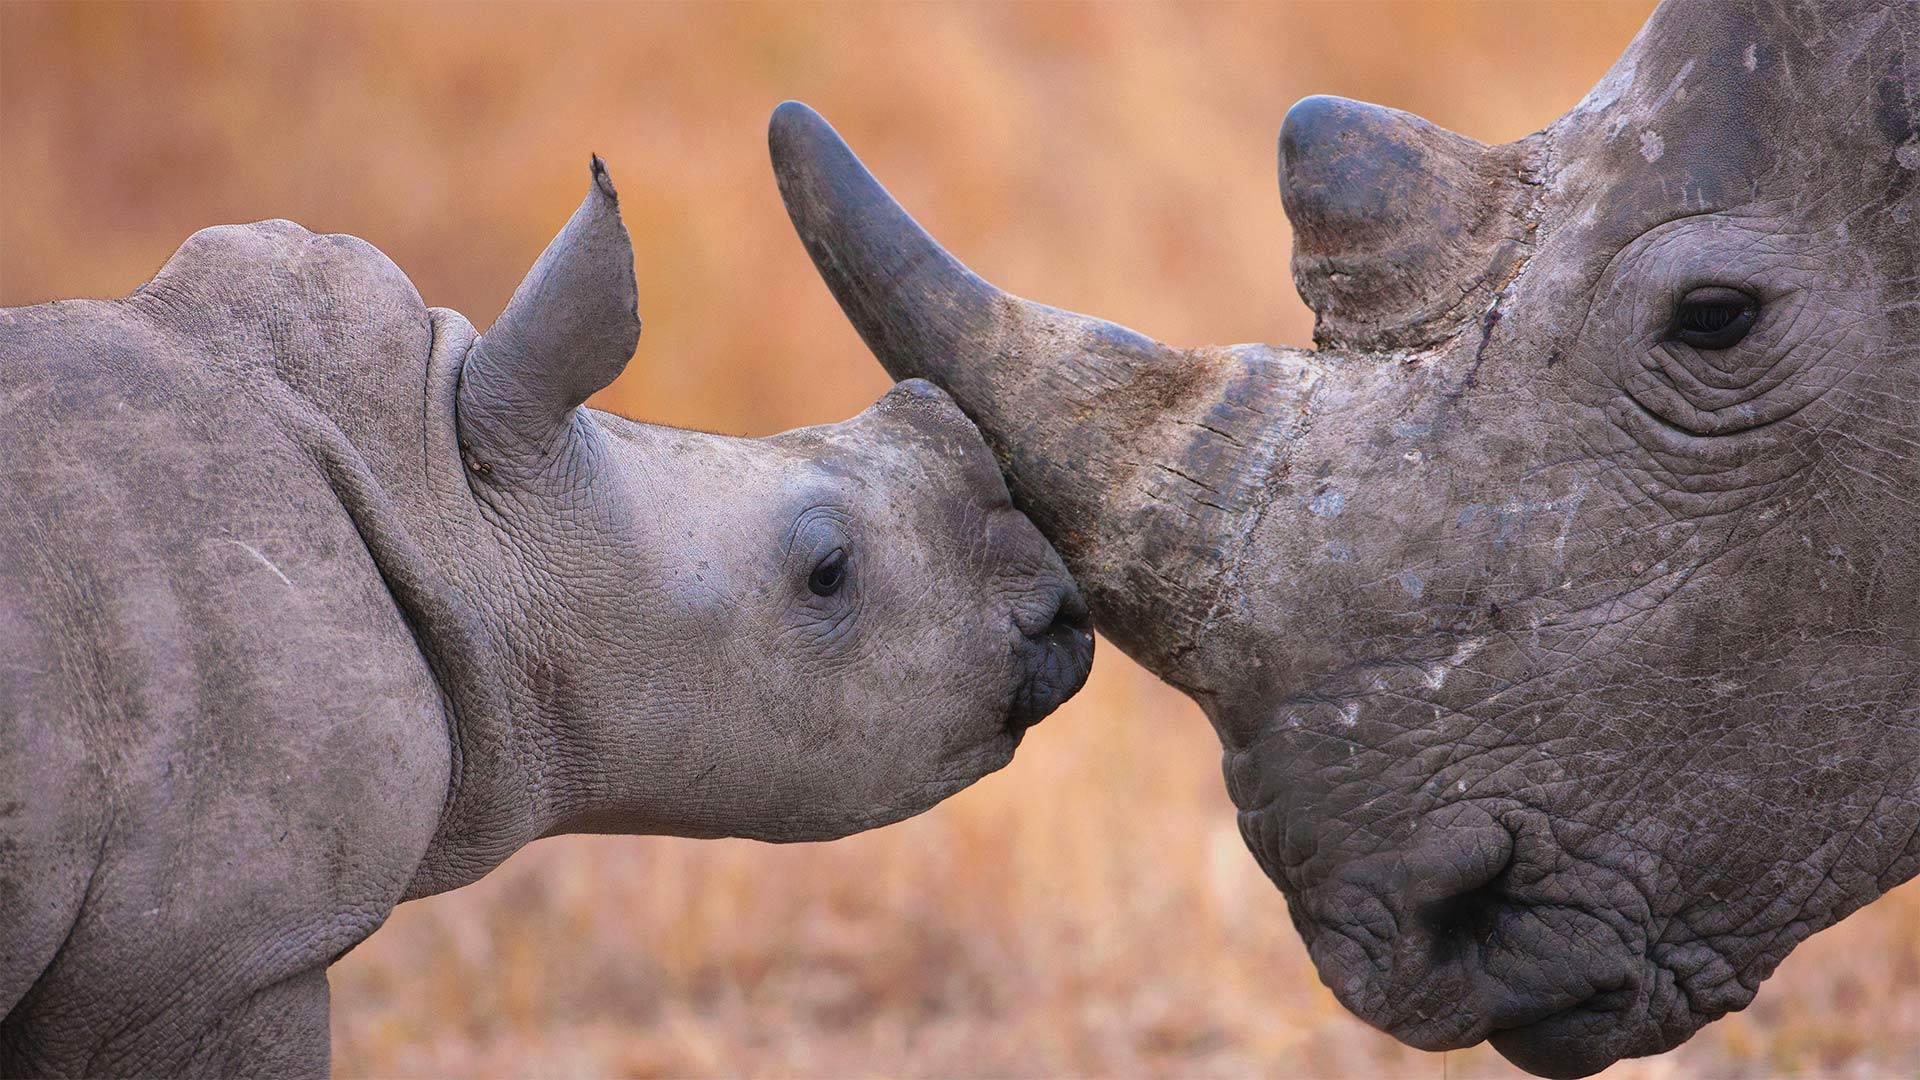 Baby white rhinoceros and mother in Hluhluwe–iMfolozi Park, South Africa (© Martin Harvey/Alamy)(Bing United States)